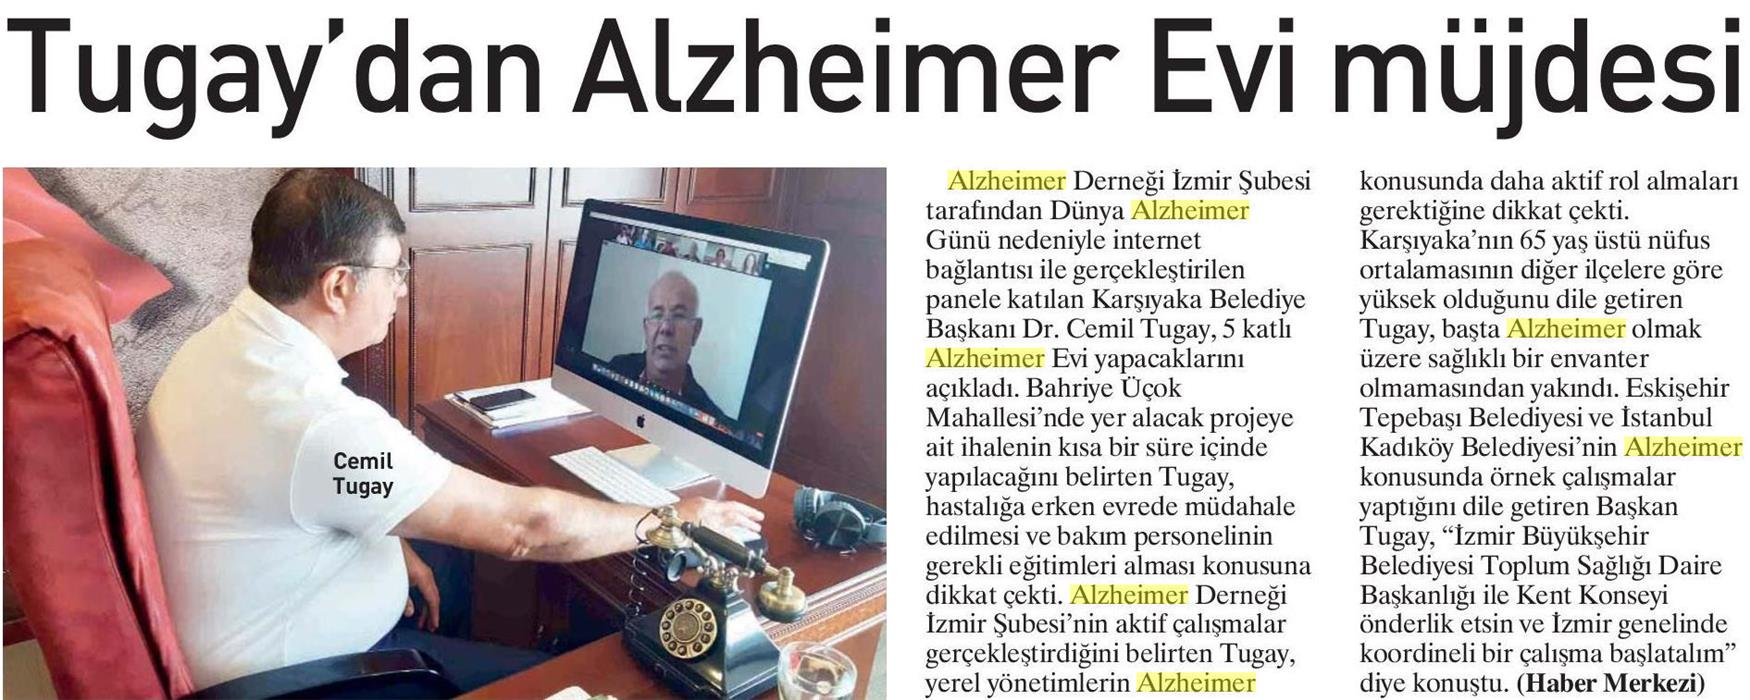 Tugay'dan Alzheimer Evi Müjdesi